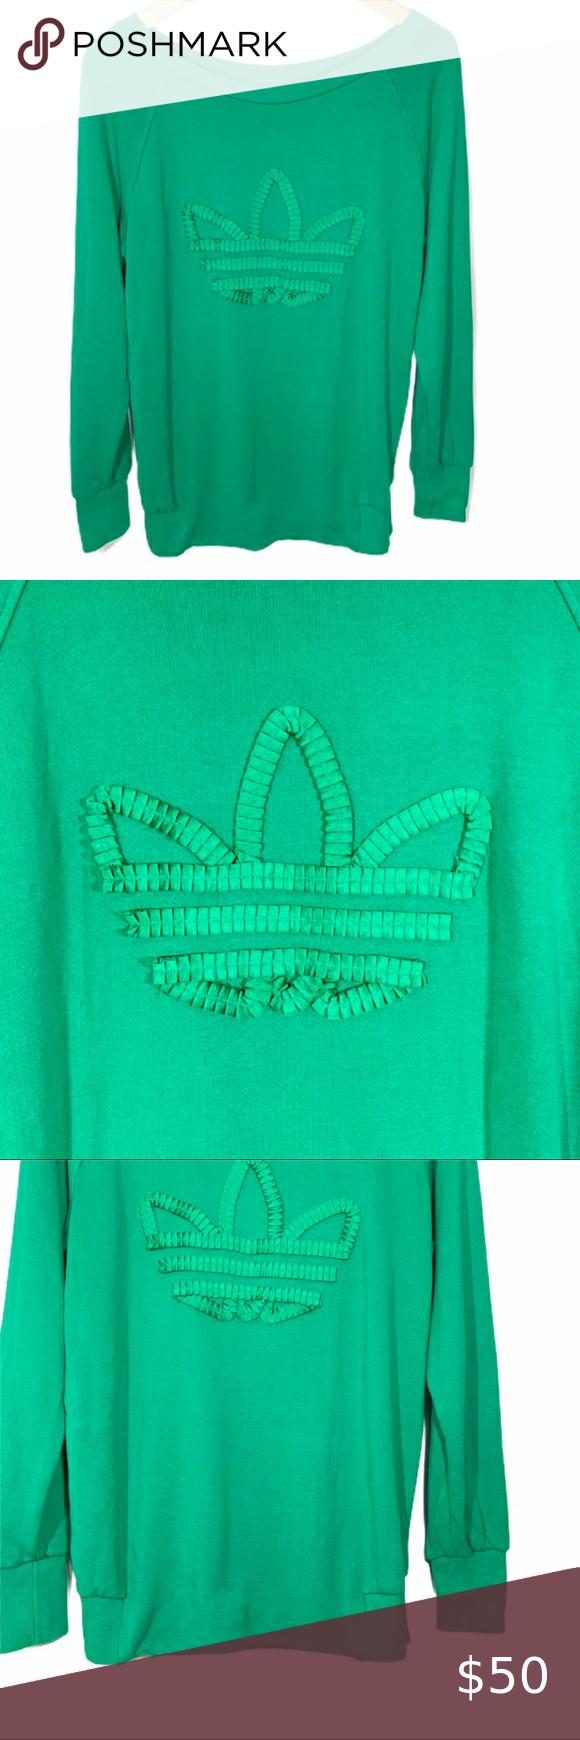 Adidas Originals Eq Ribbon Logo Sweatshirt Sweatshirts Adidas Originals Adidas Tops [ 1740 x 580 Pixel ]